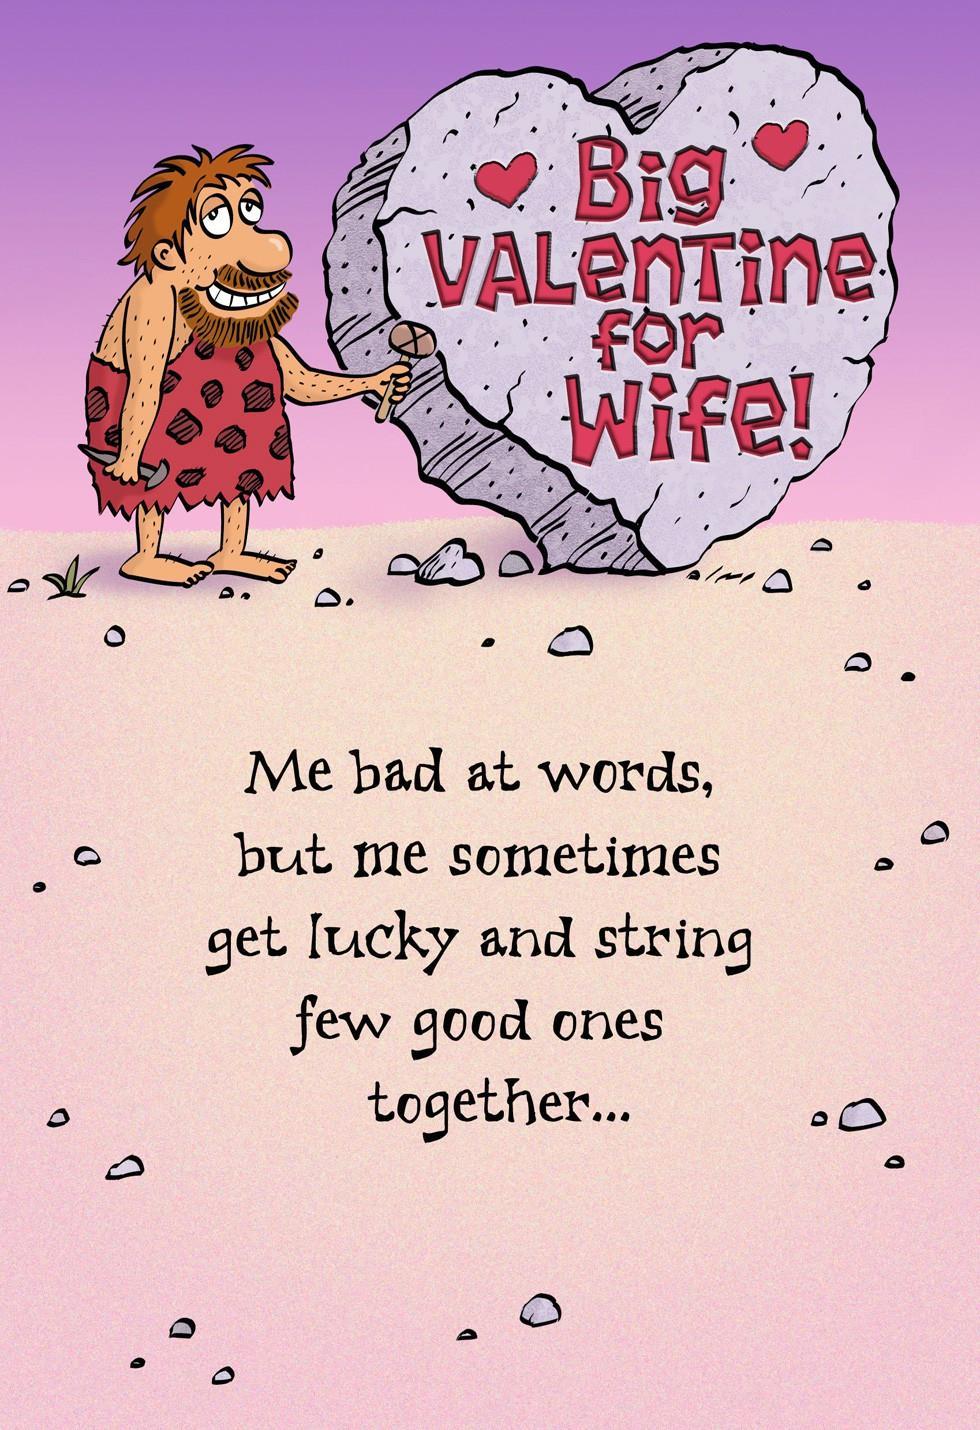 Bearded Caveman Big Valentine For Wife Valentines Day Card – Wife Valentines Day Card